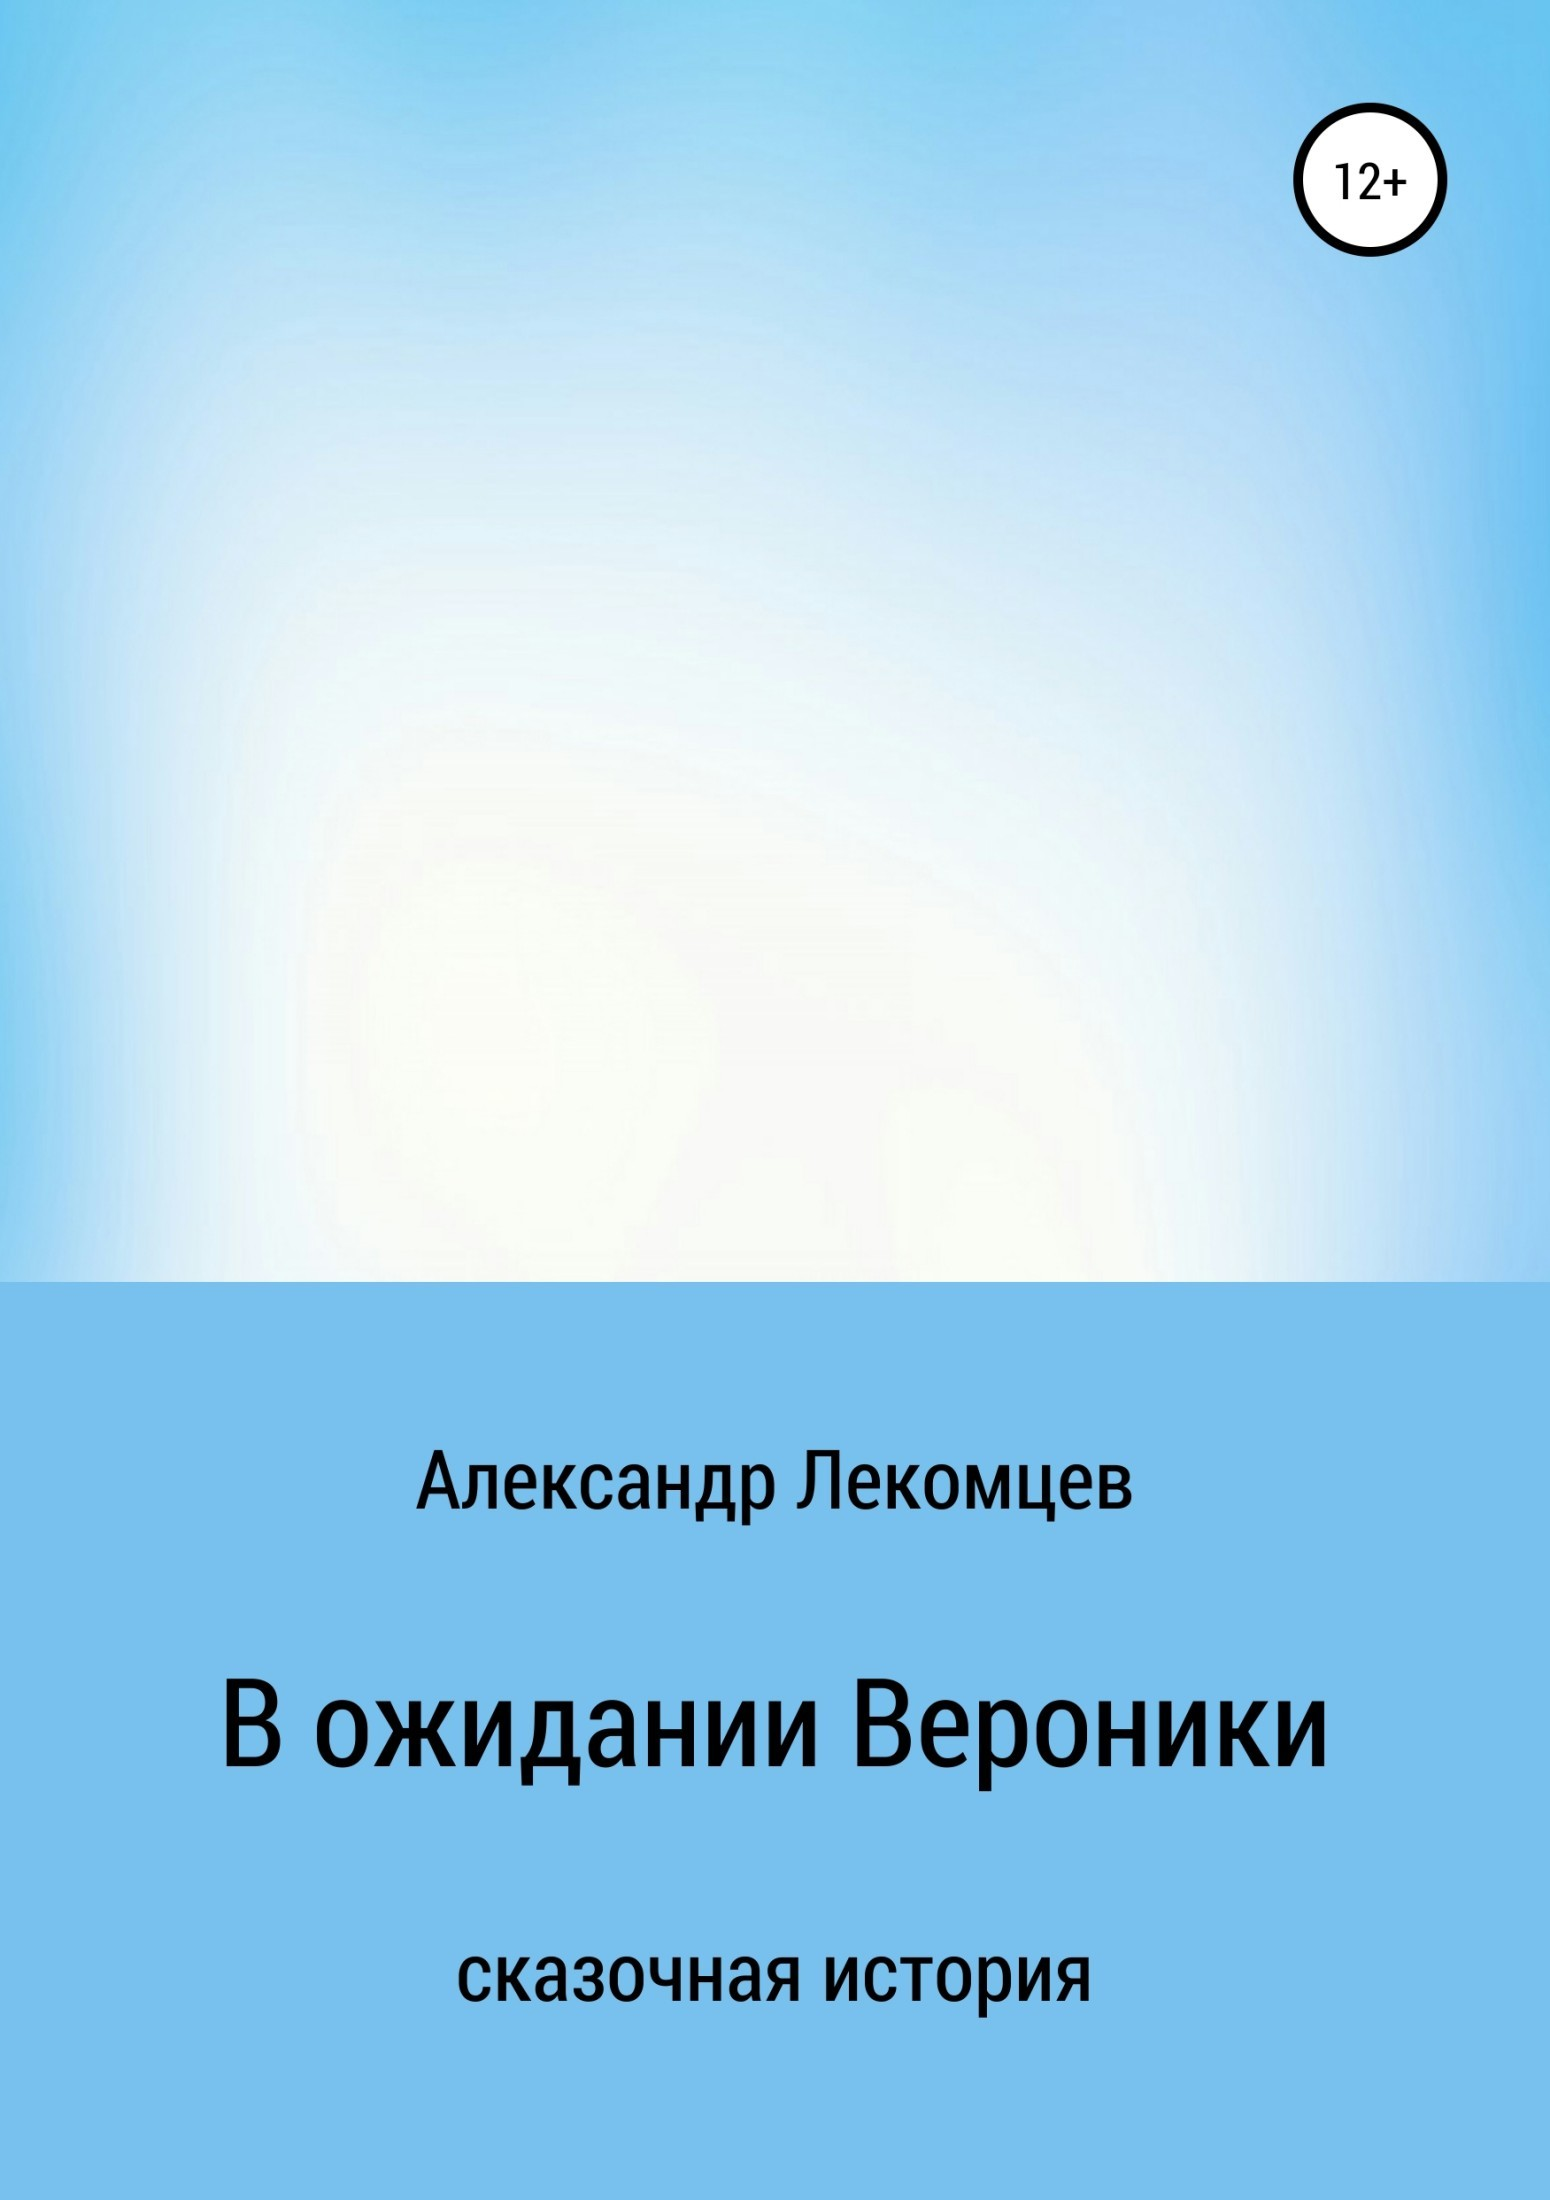 Александр Лекомцев - В ожидании Вероники